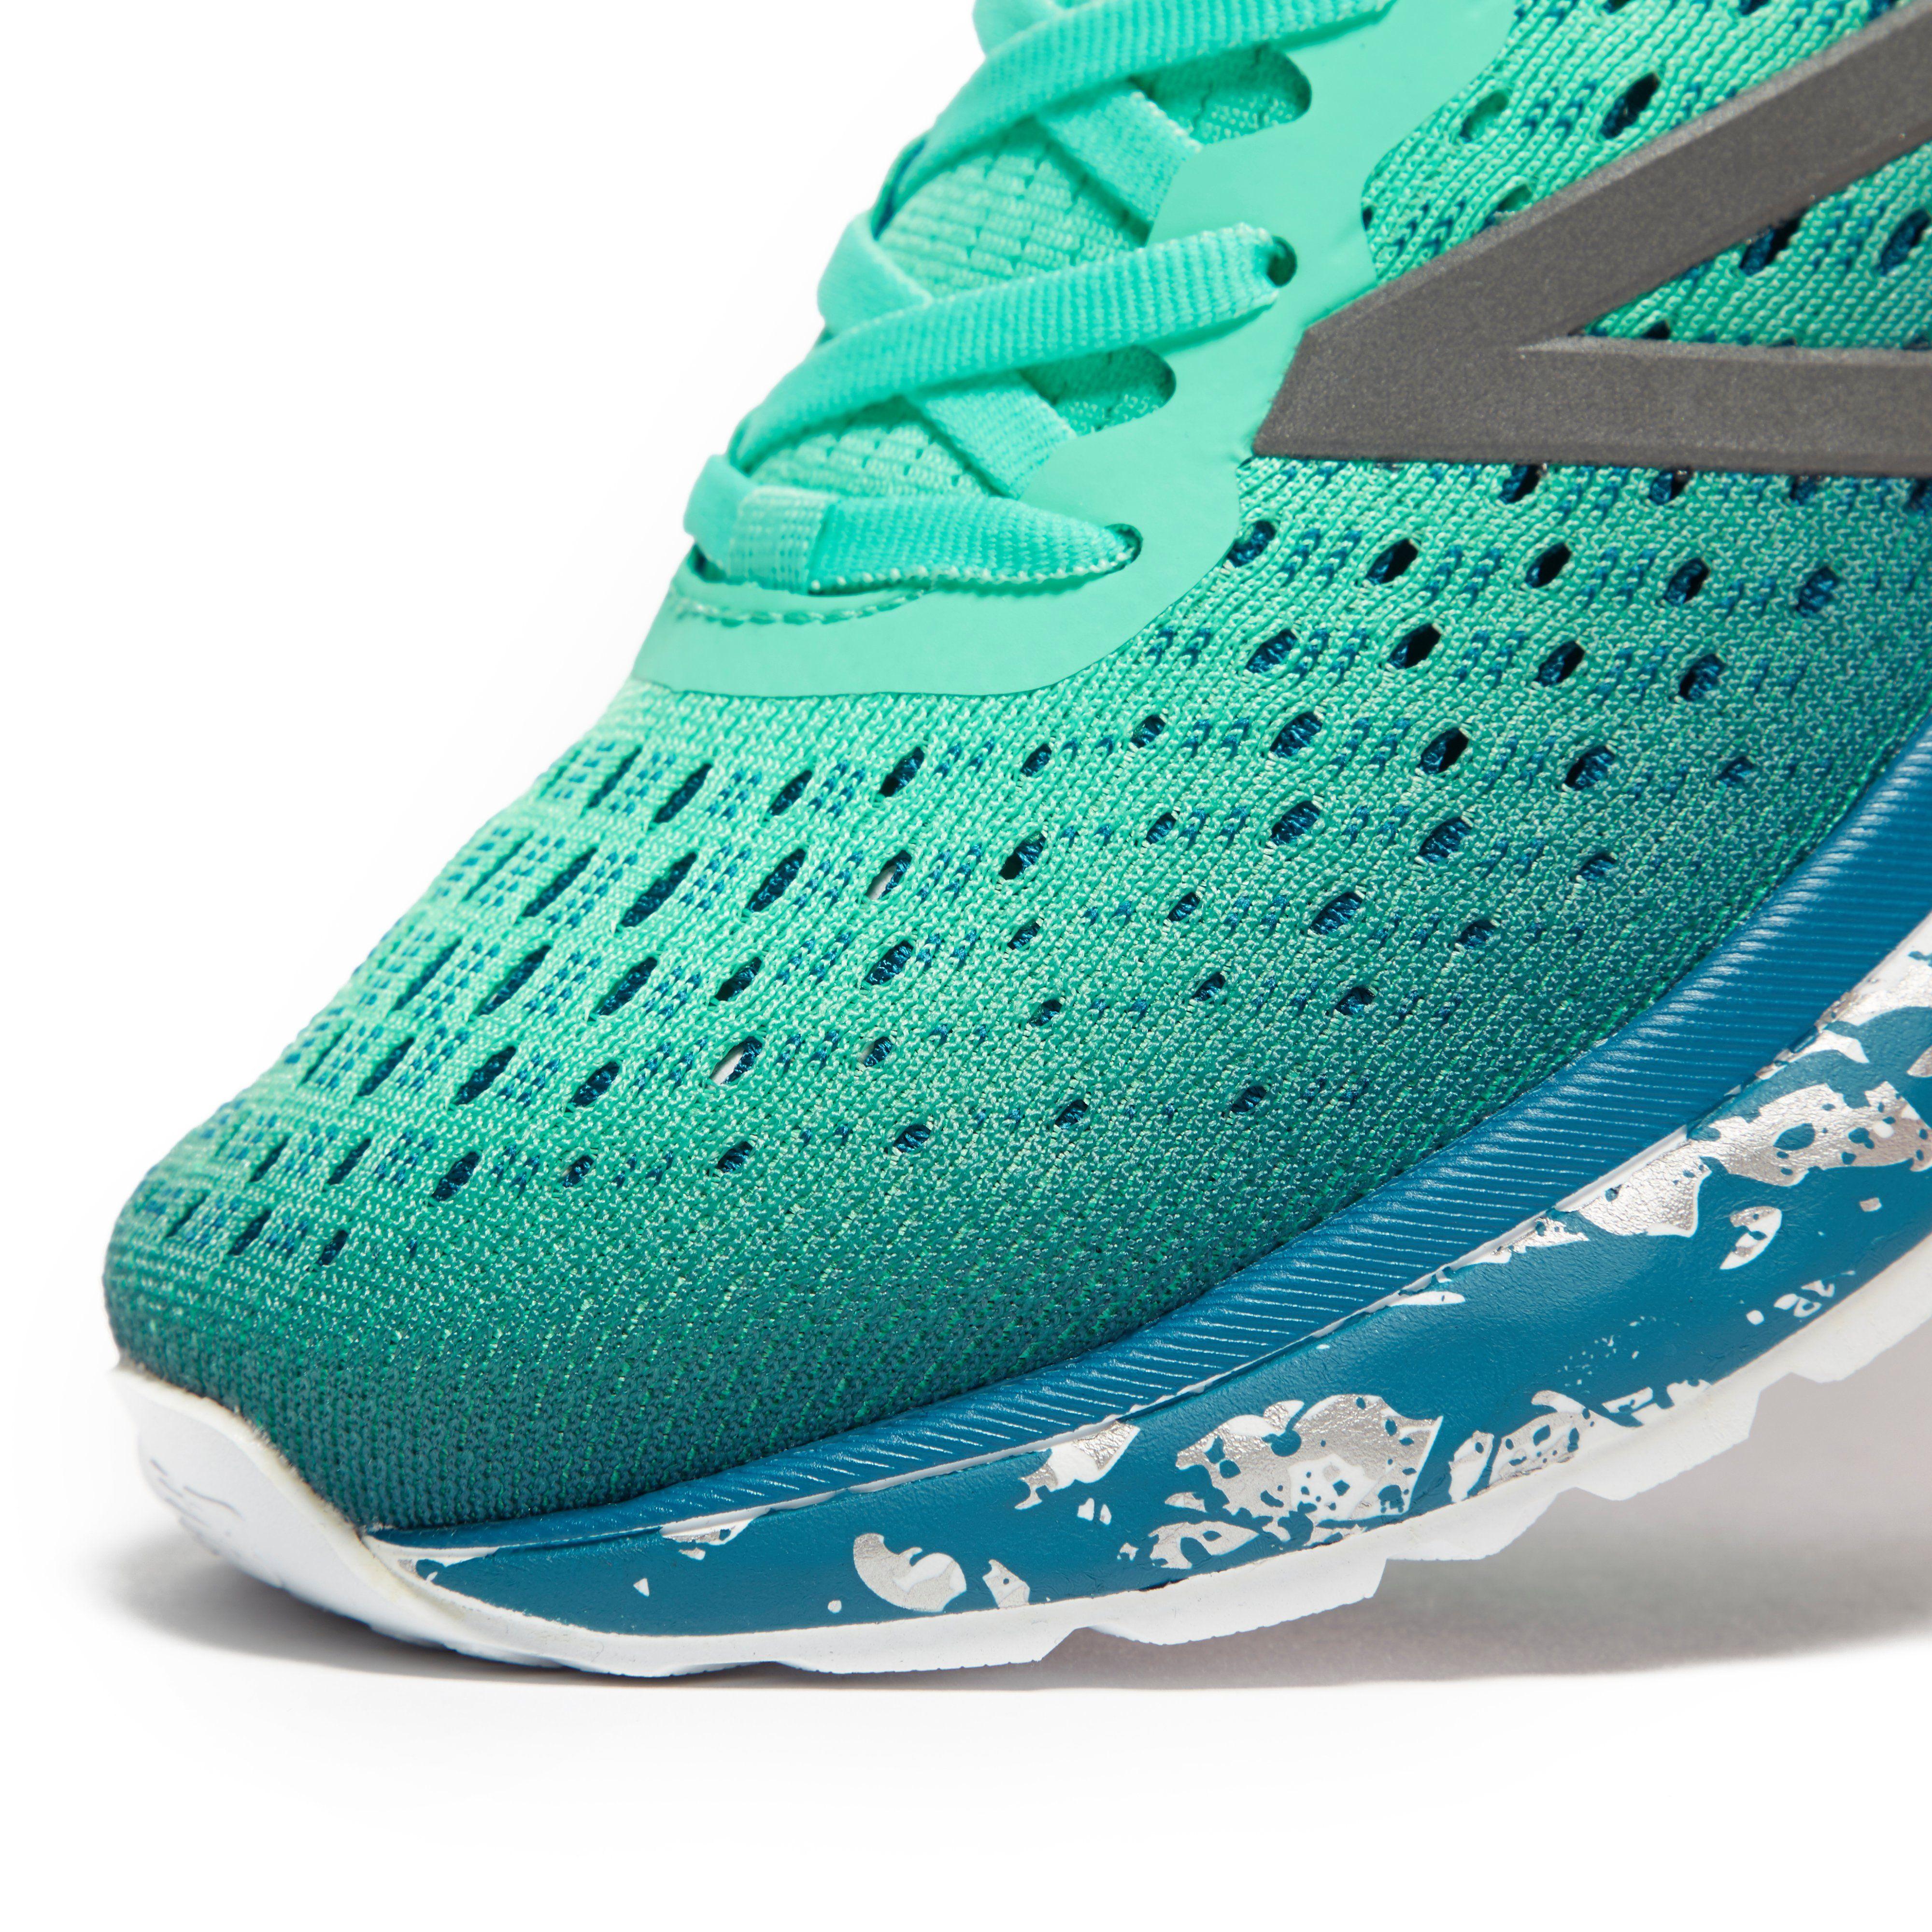 New Balance 1080v9 London Marathon Edition Men's Running Shoes